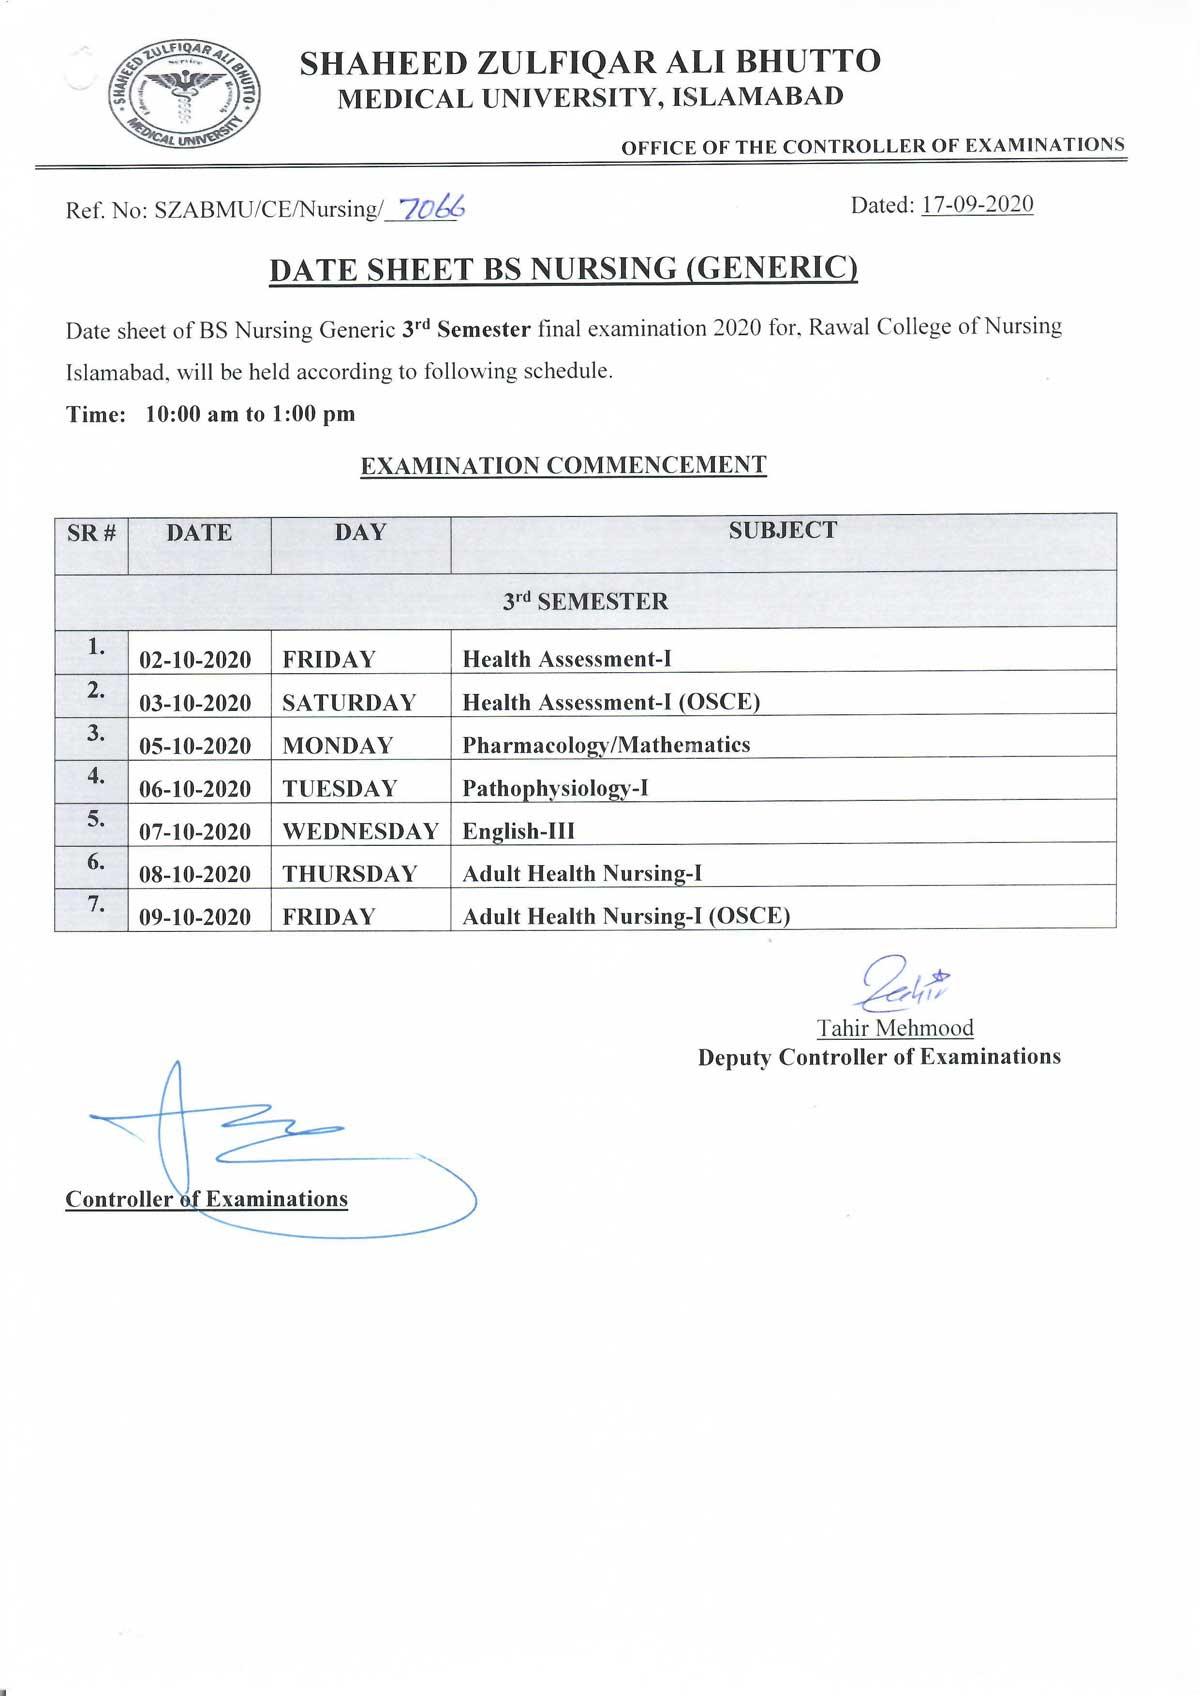 3rd Semester Date Sheet of BS Generic Nursing